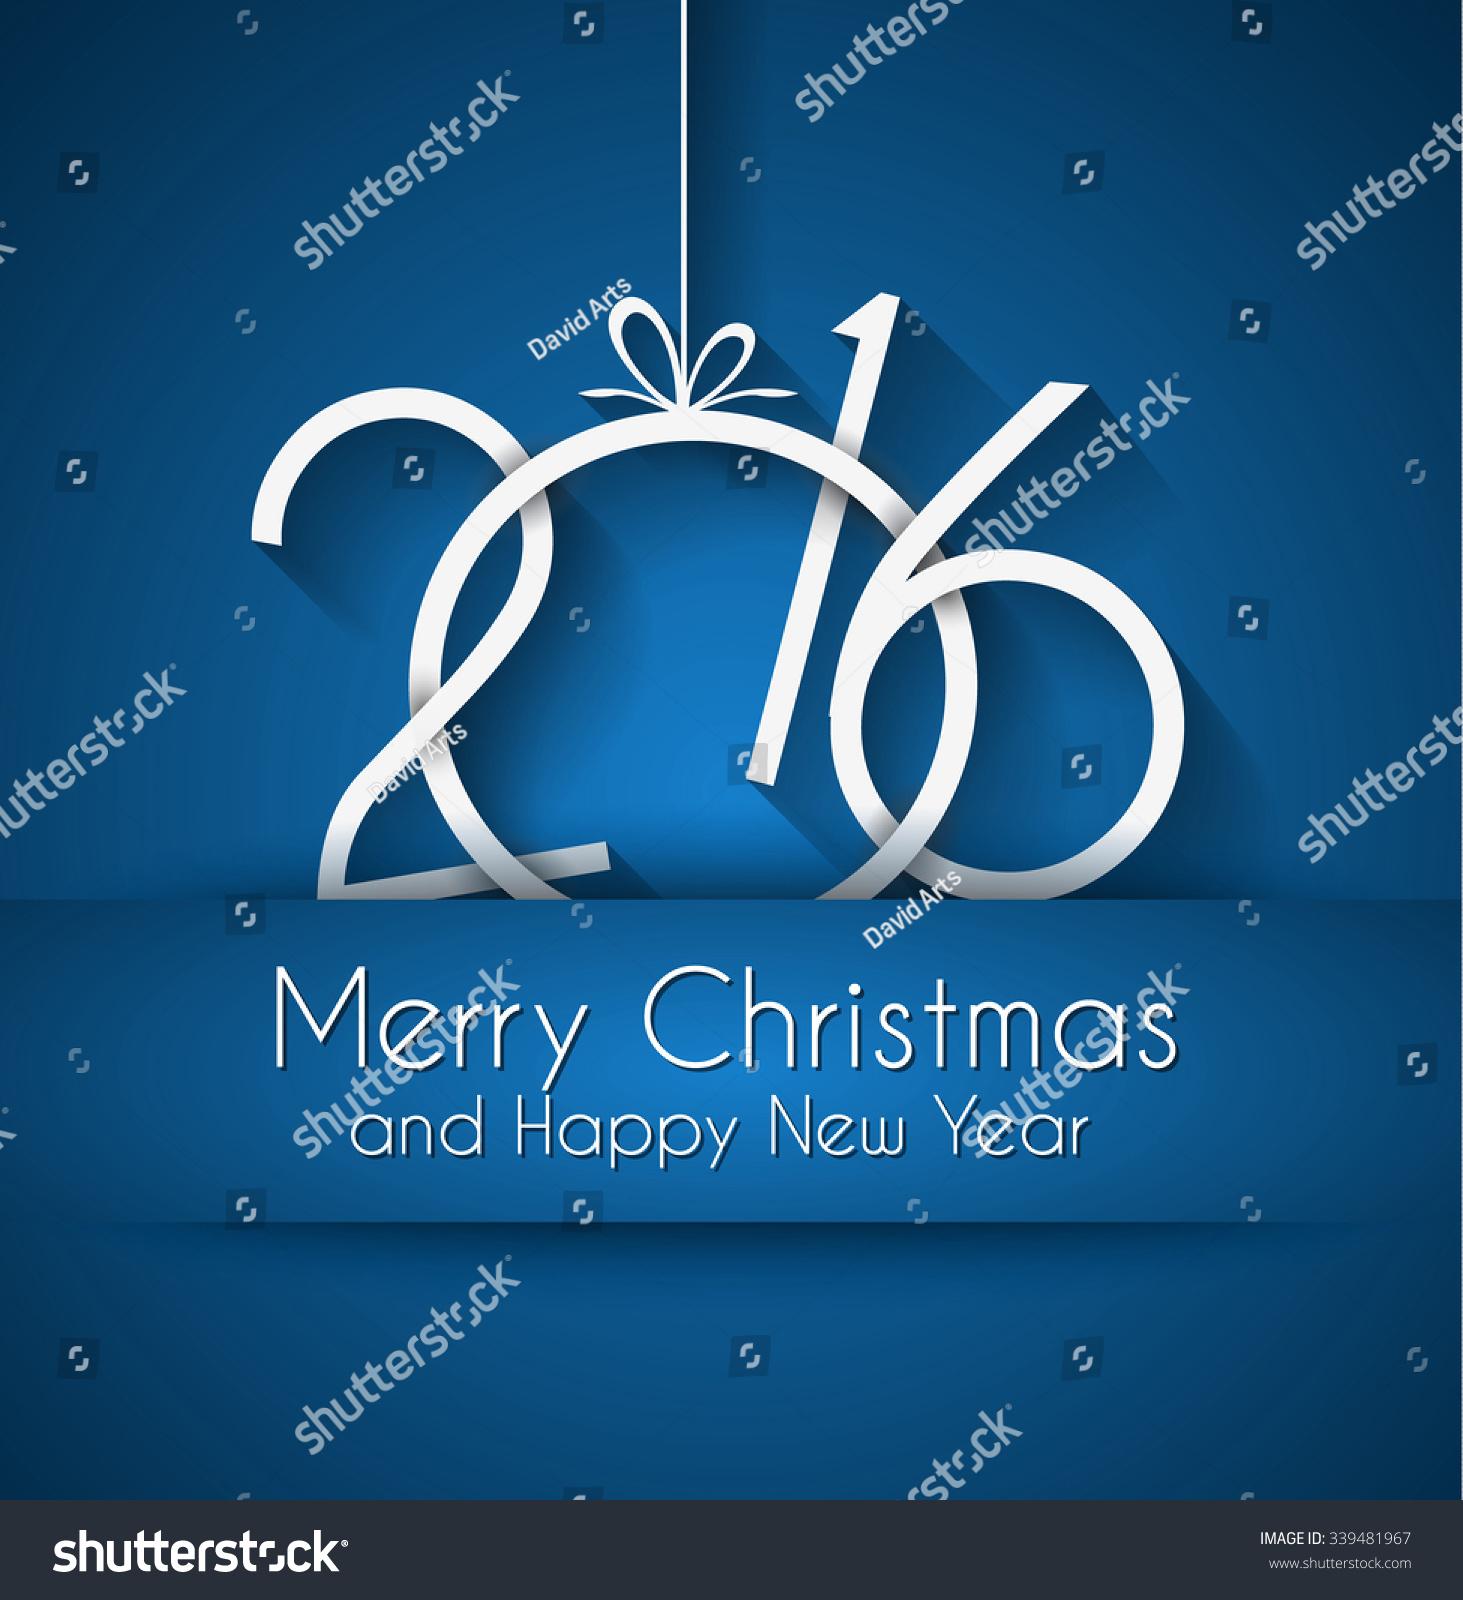 2016 Happy New Year Merry Christmas 339481967